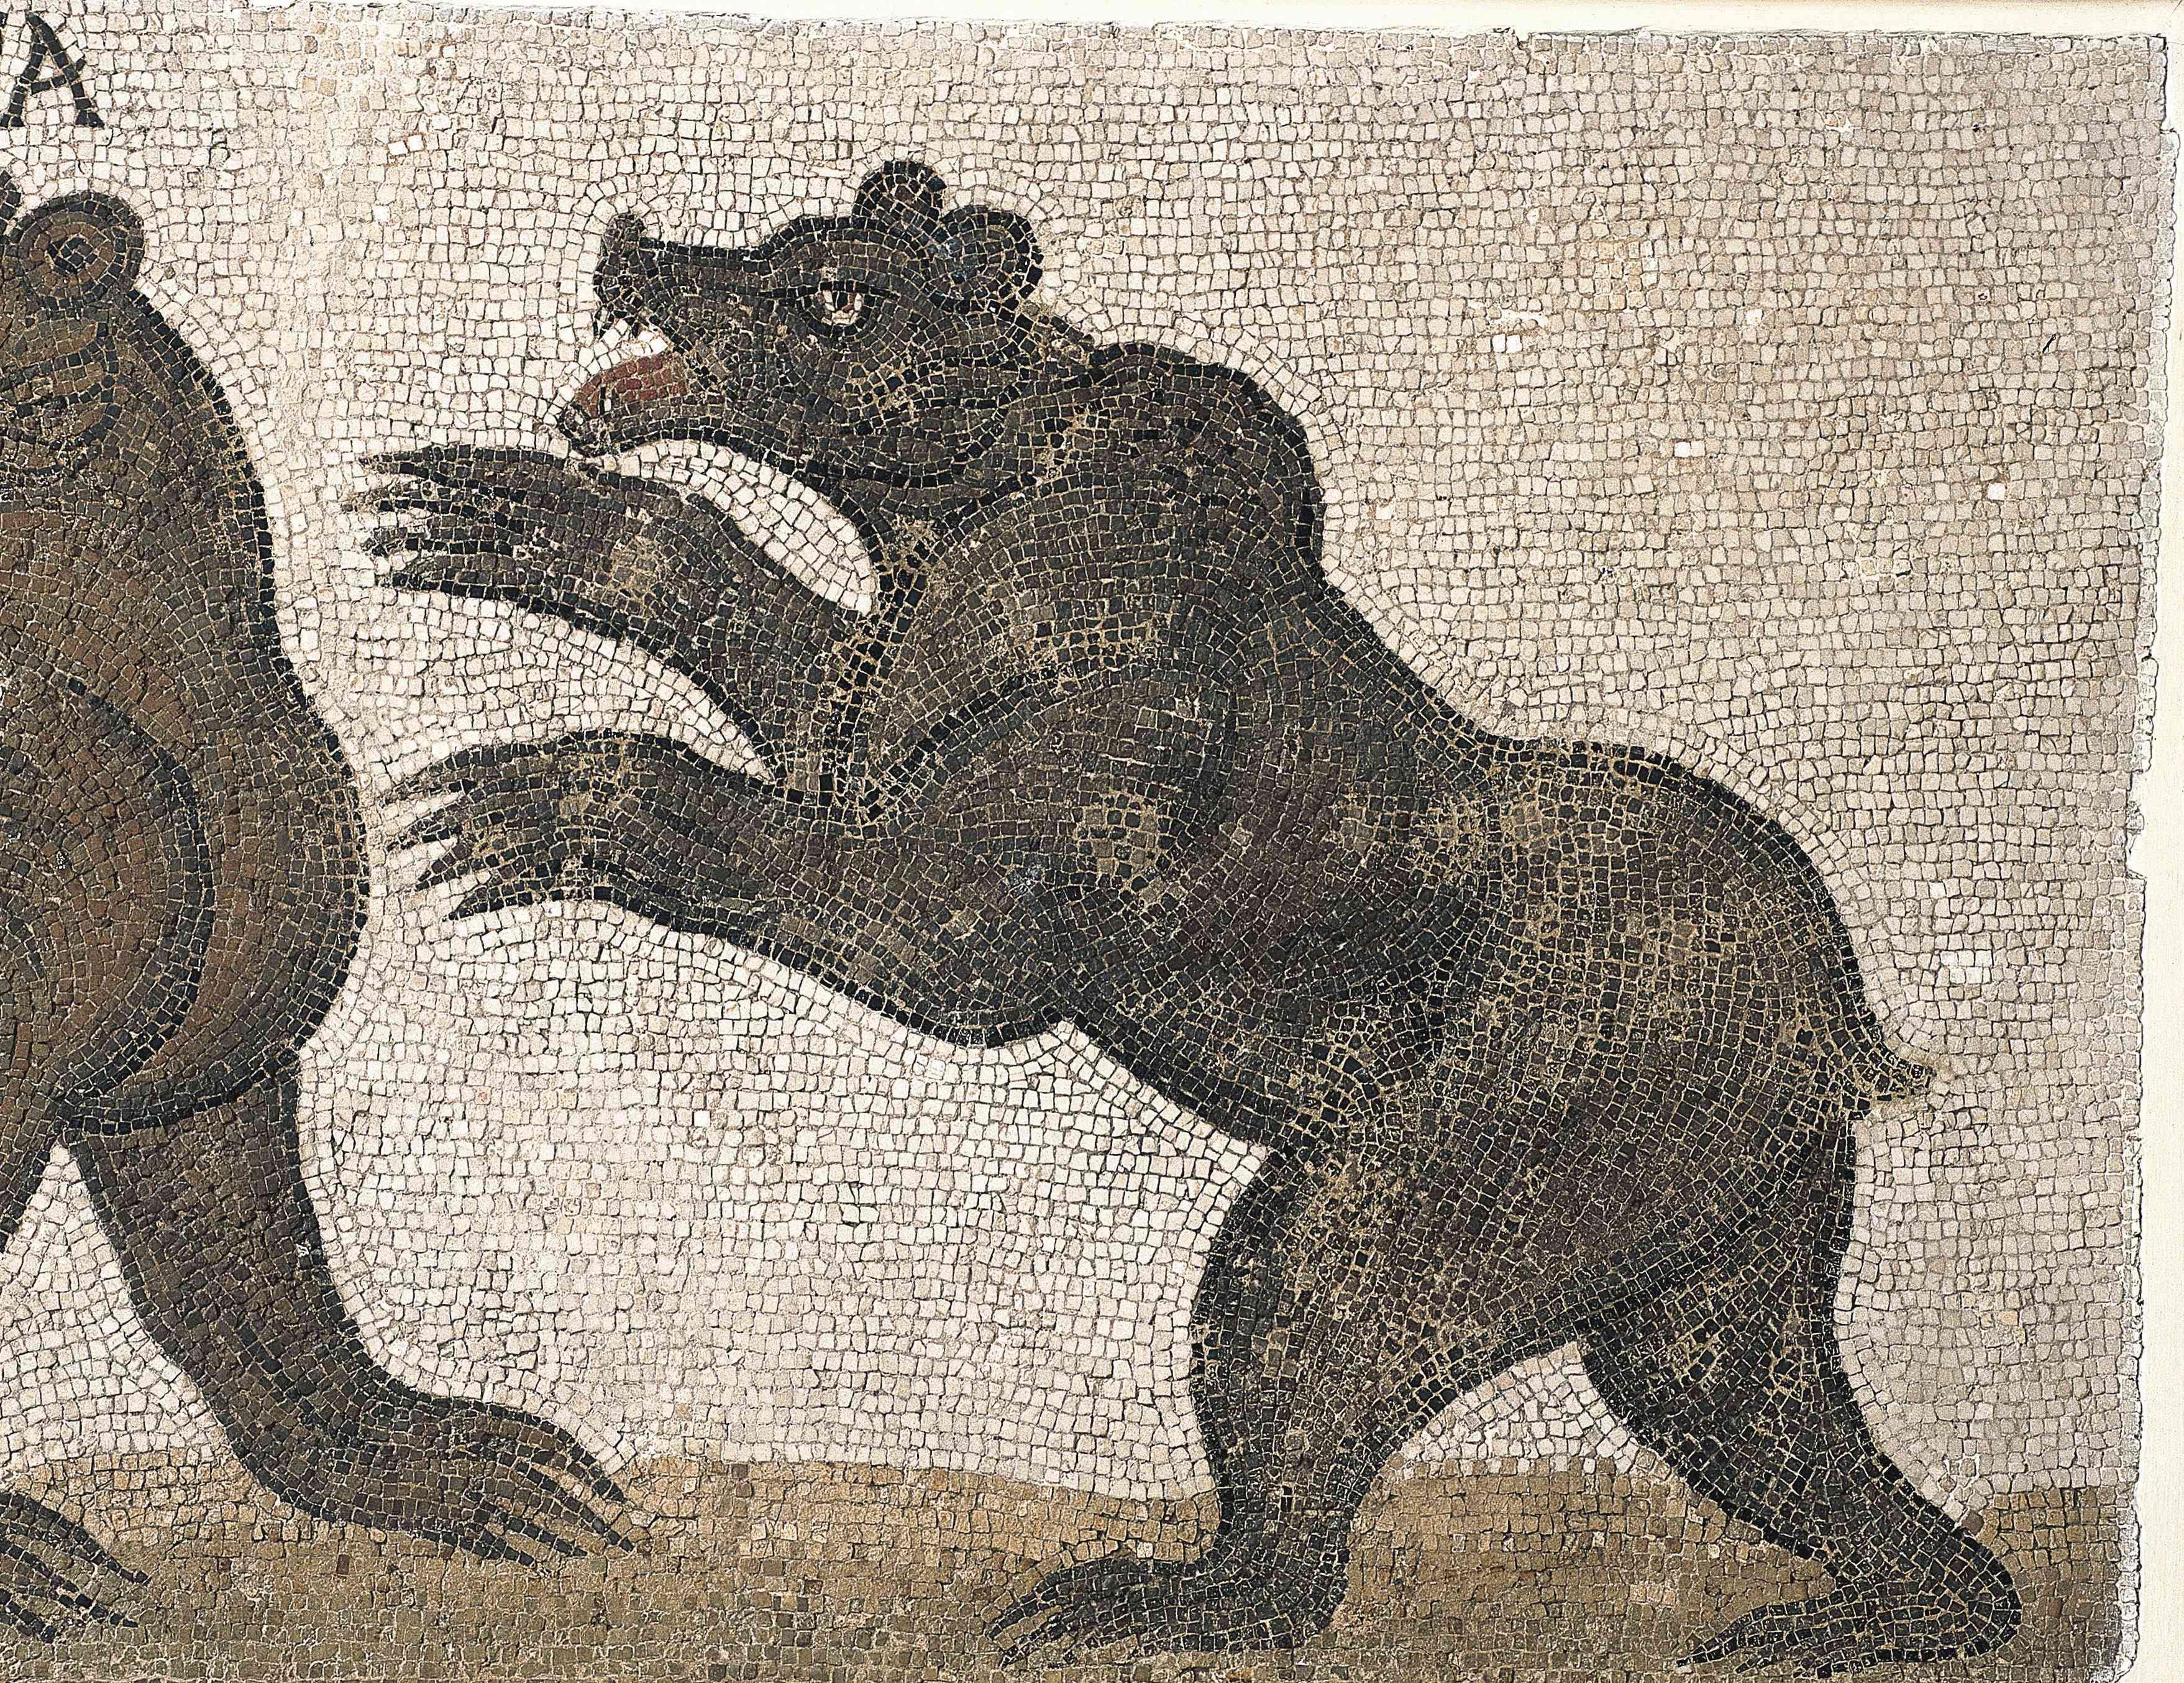 Mosaic depicting an Atlas bear attacking Carthage, Tunisia